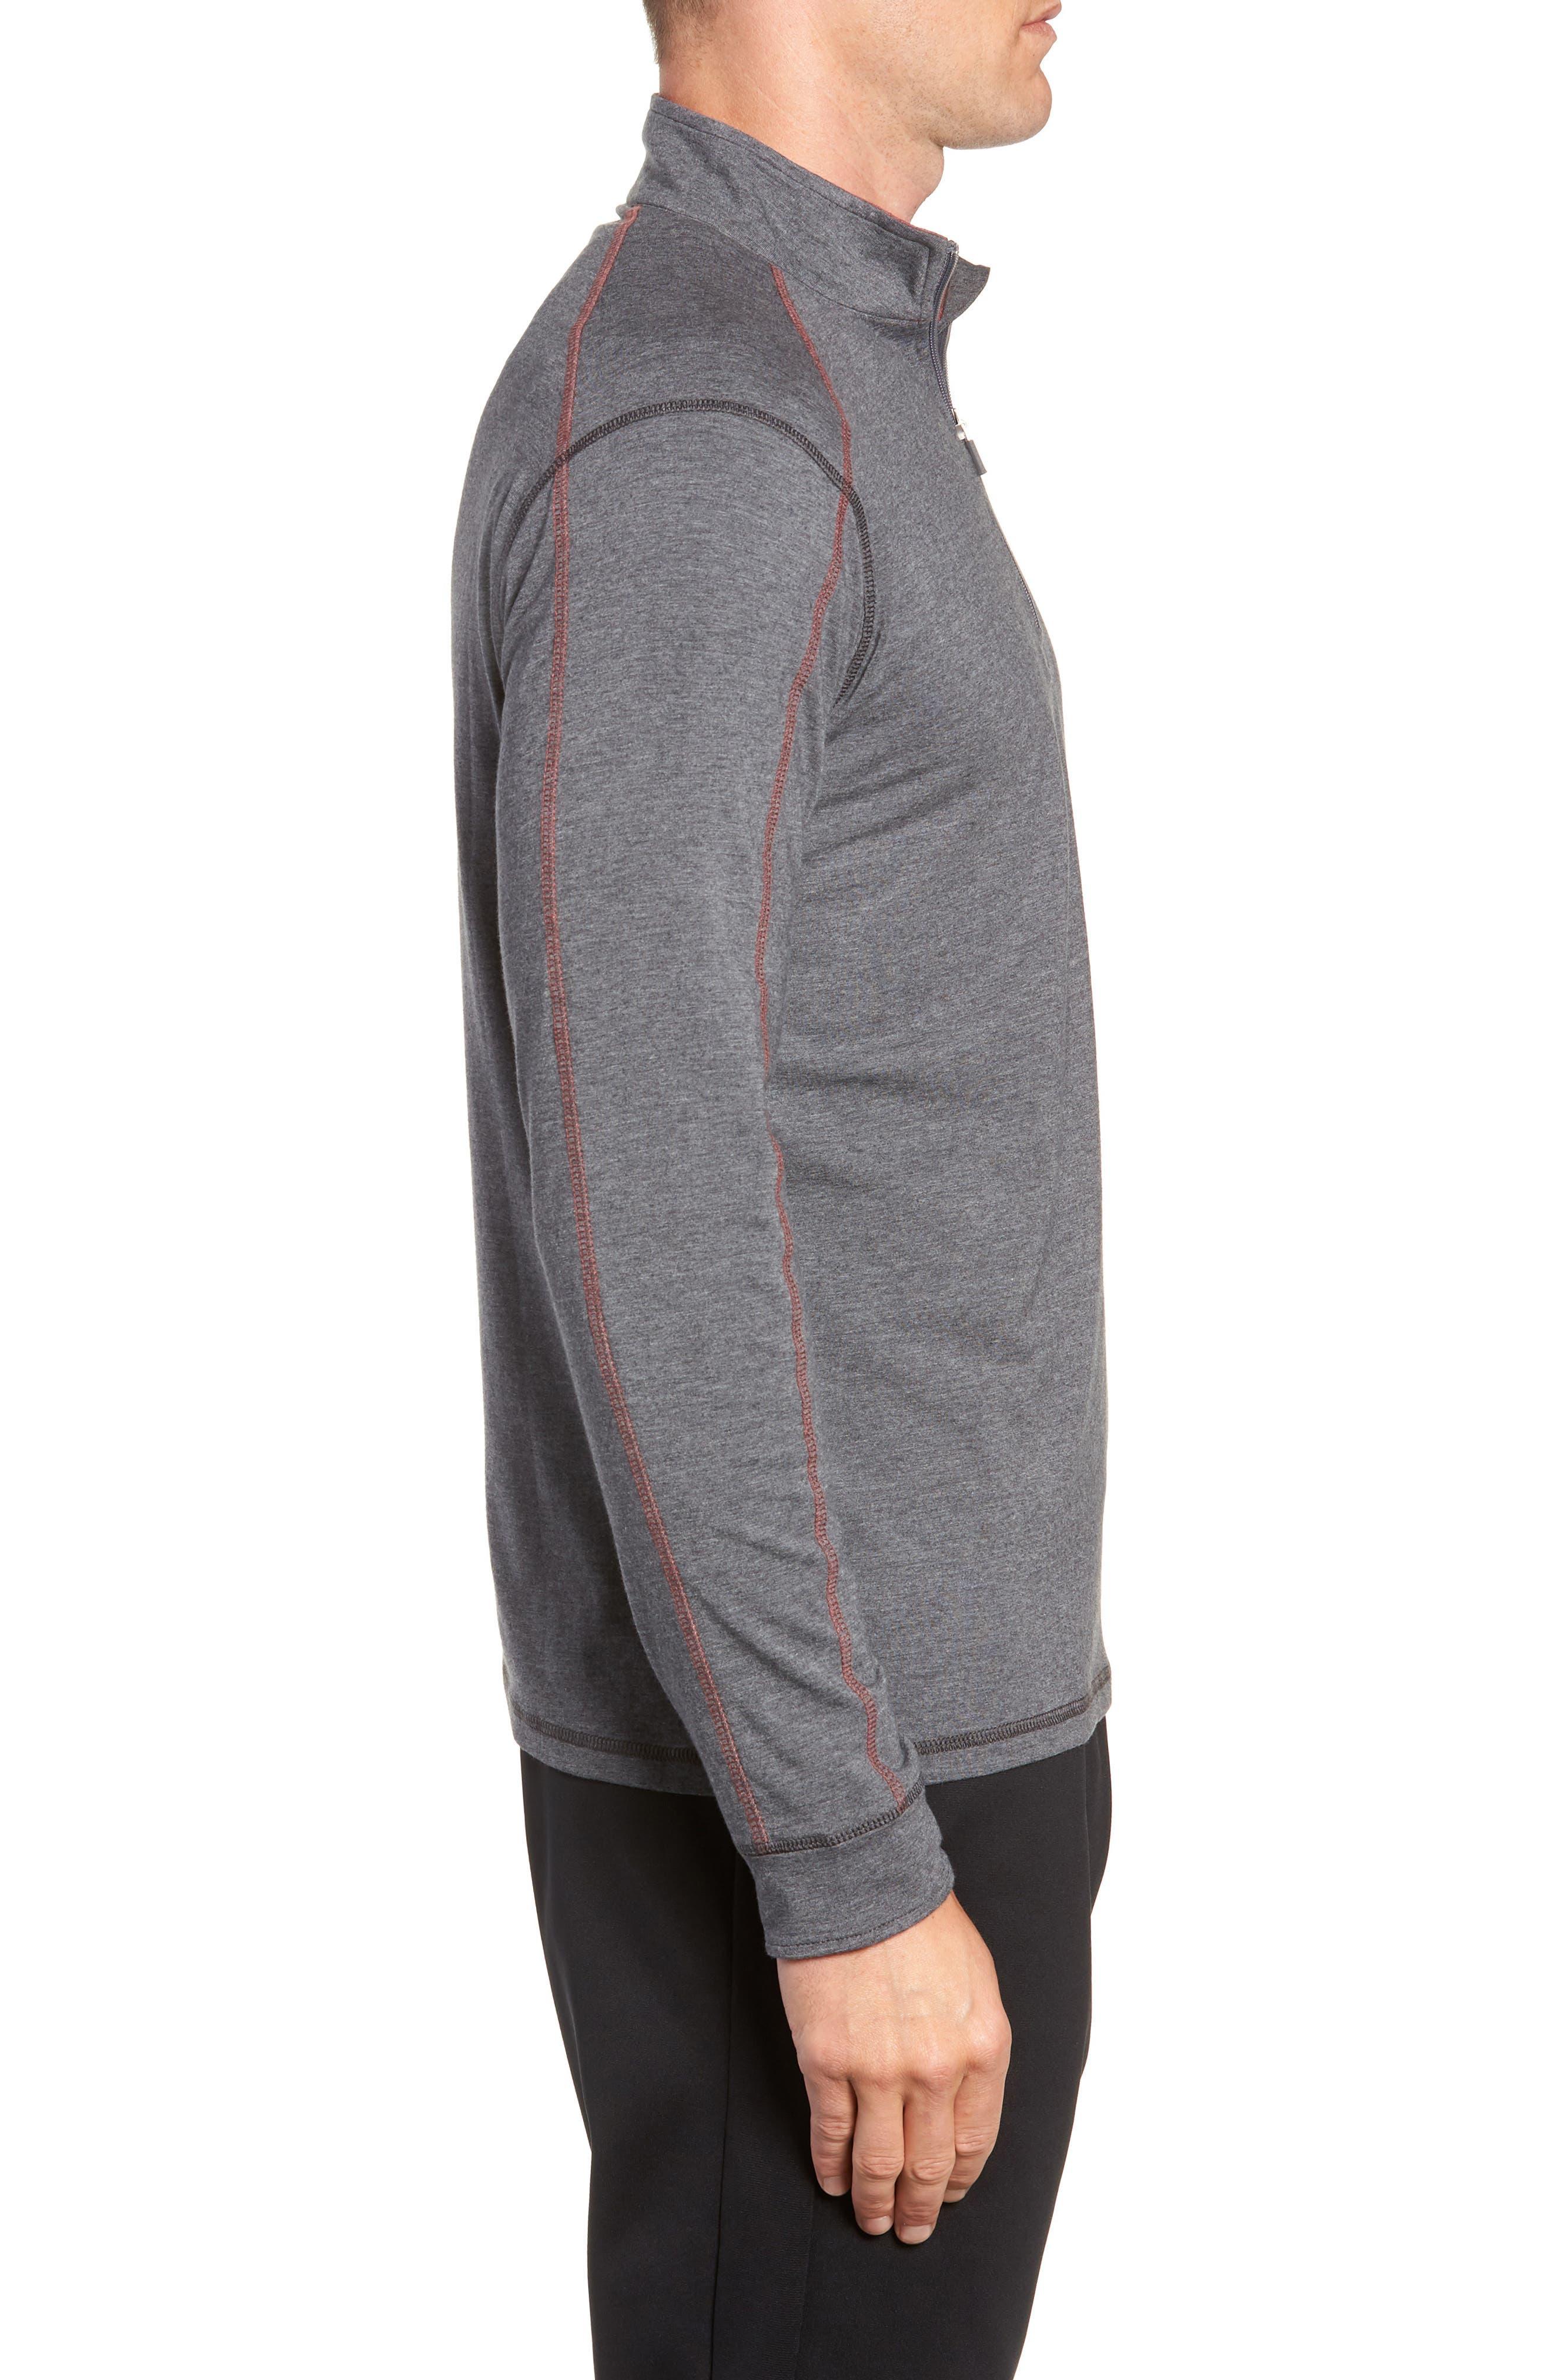 TASC PERFORMANCE, Carrollton Quarter Zip Sweatshirt, Alternate thumbnail 3, color, BLACK HEATHER/ MERCURY